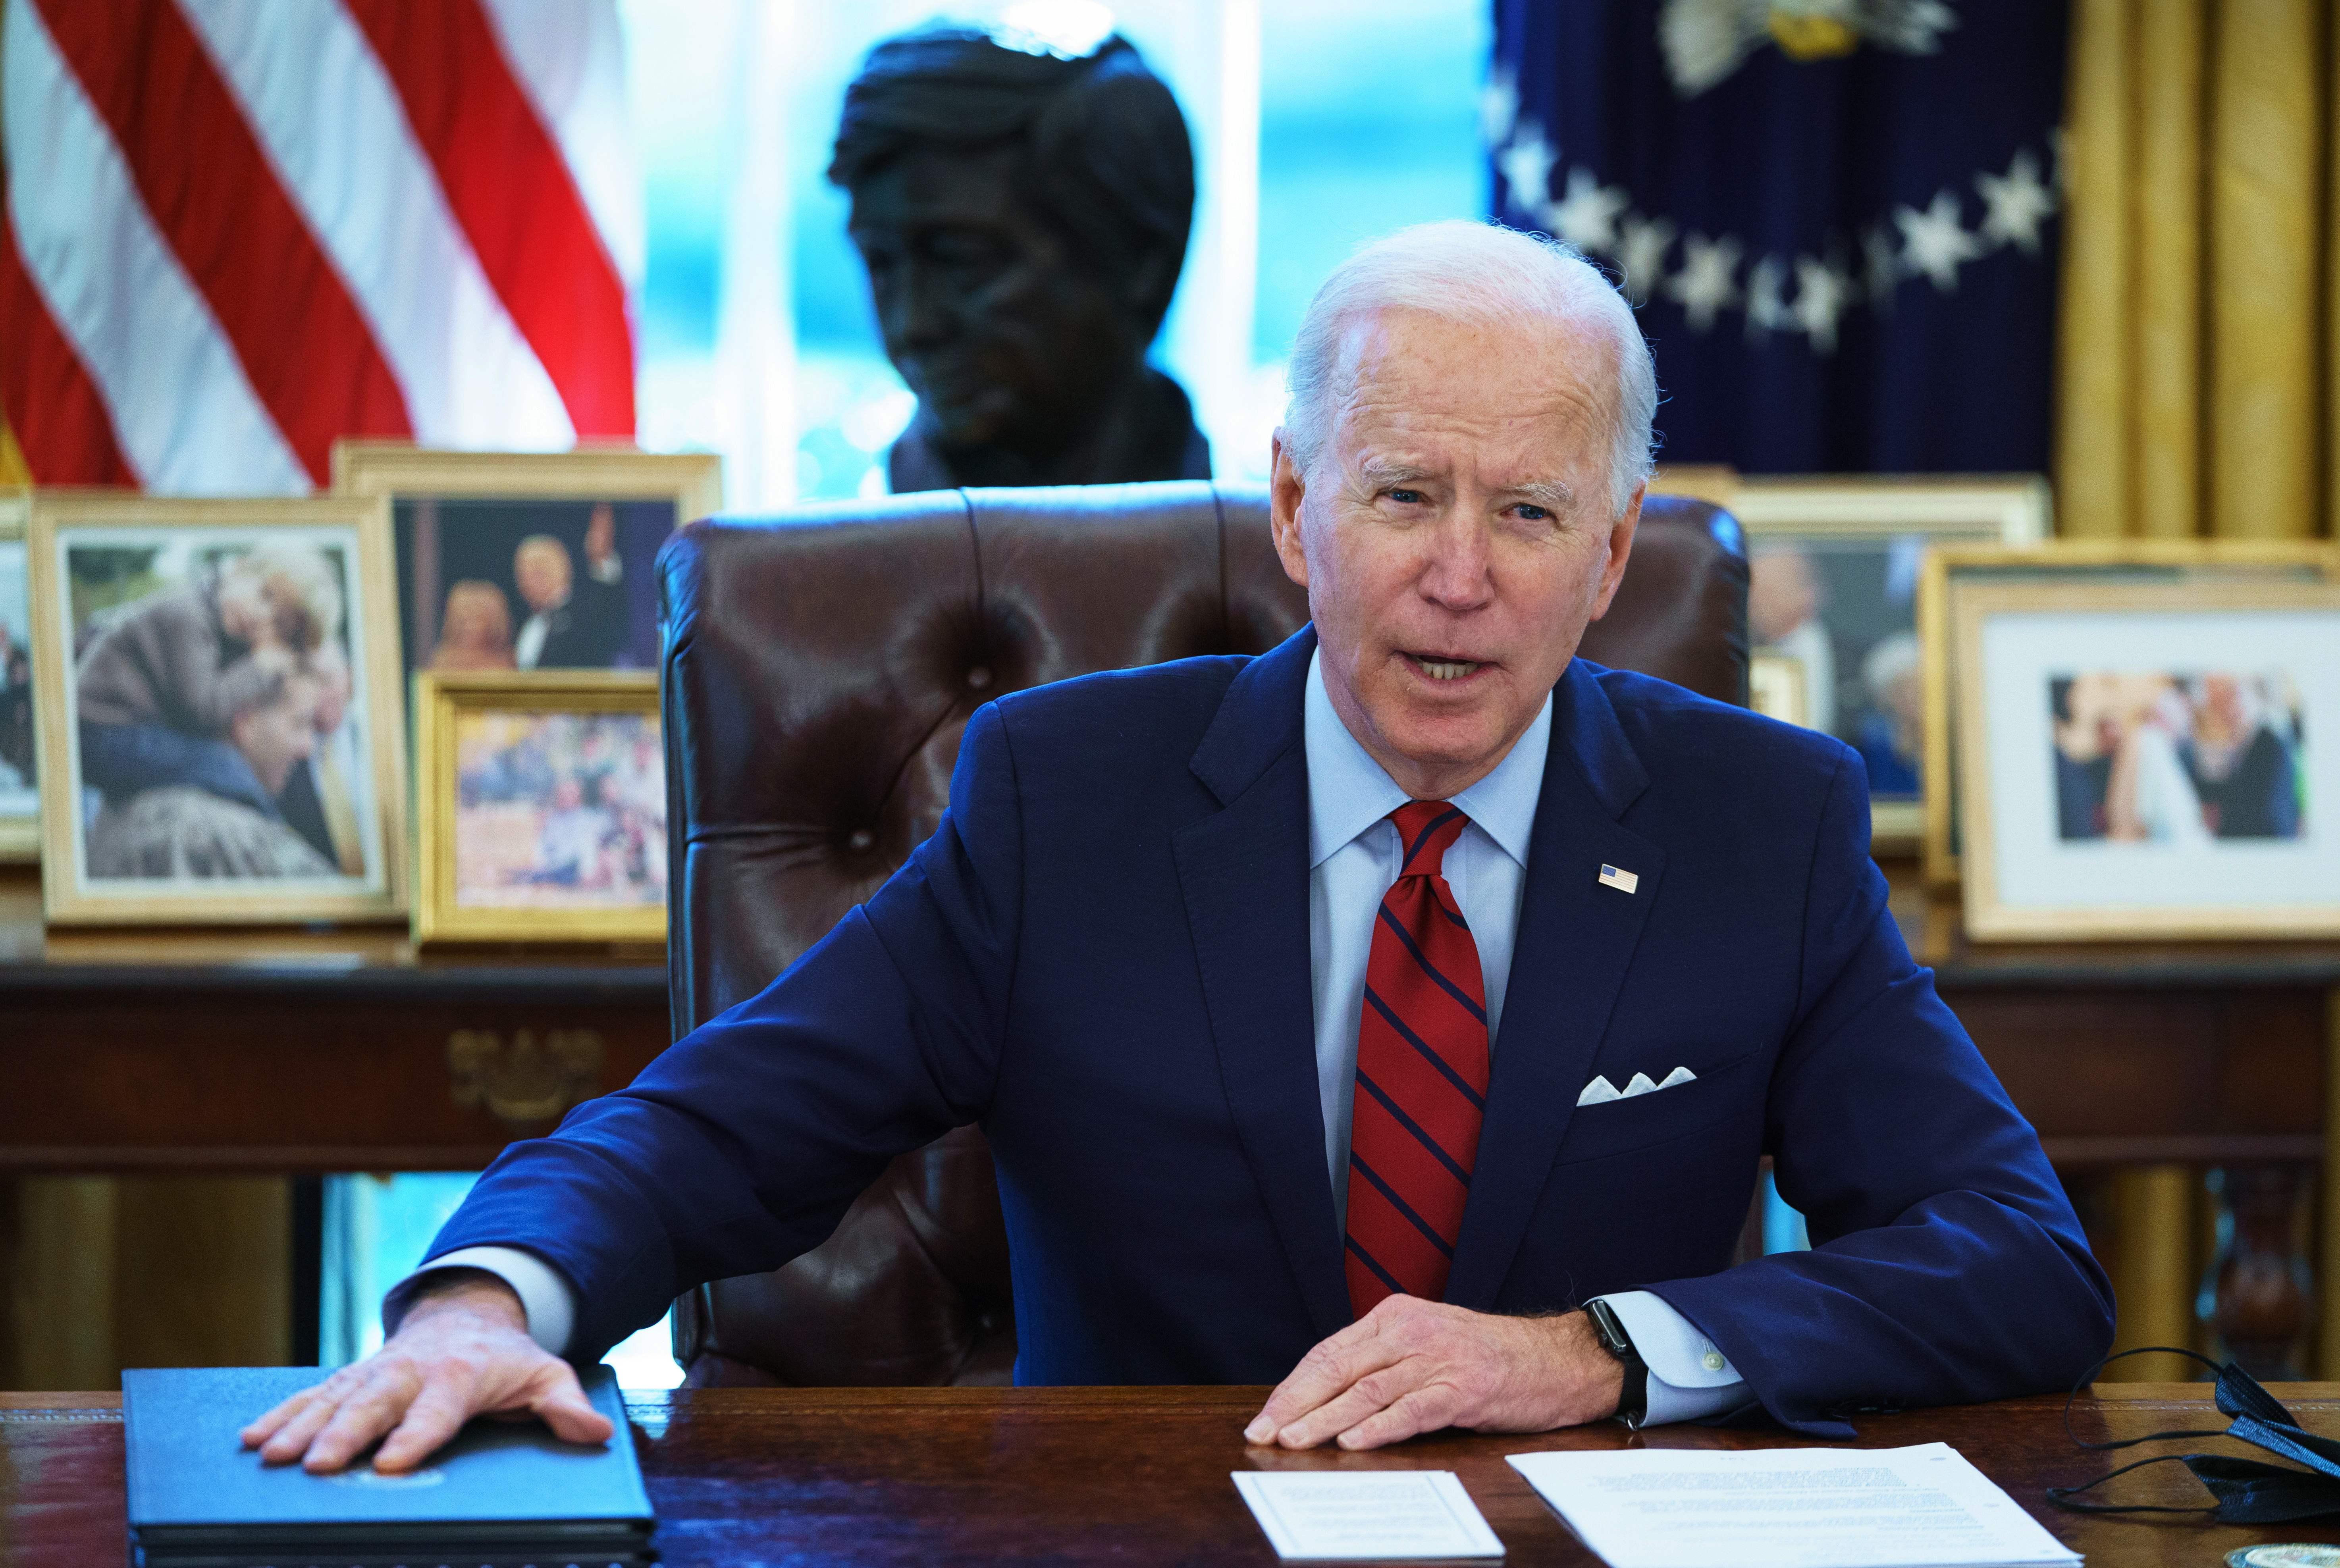 President Joe Biden speaks at the Oval Office in the White House on January 28, 2021.